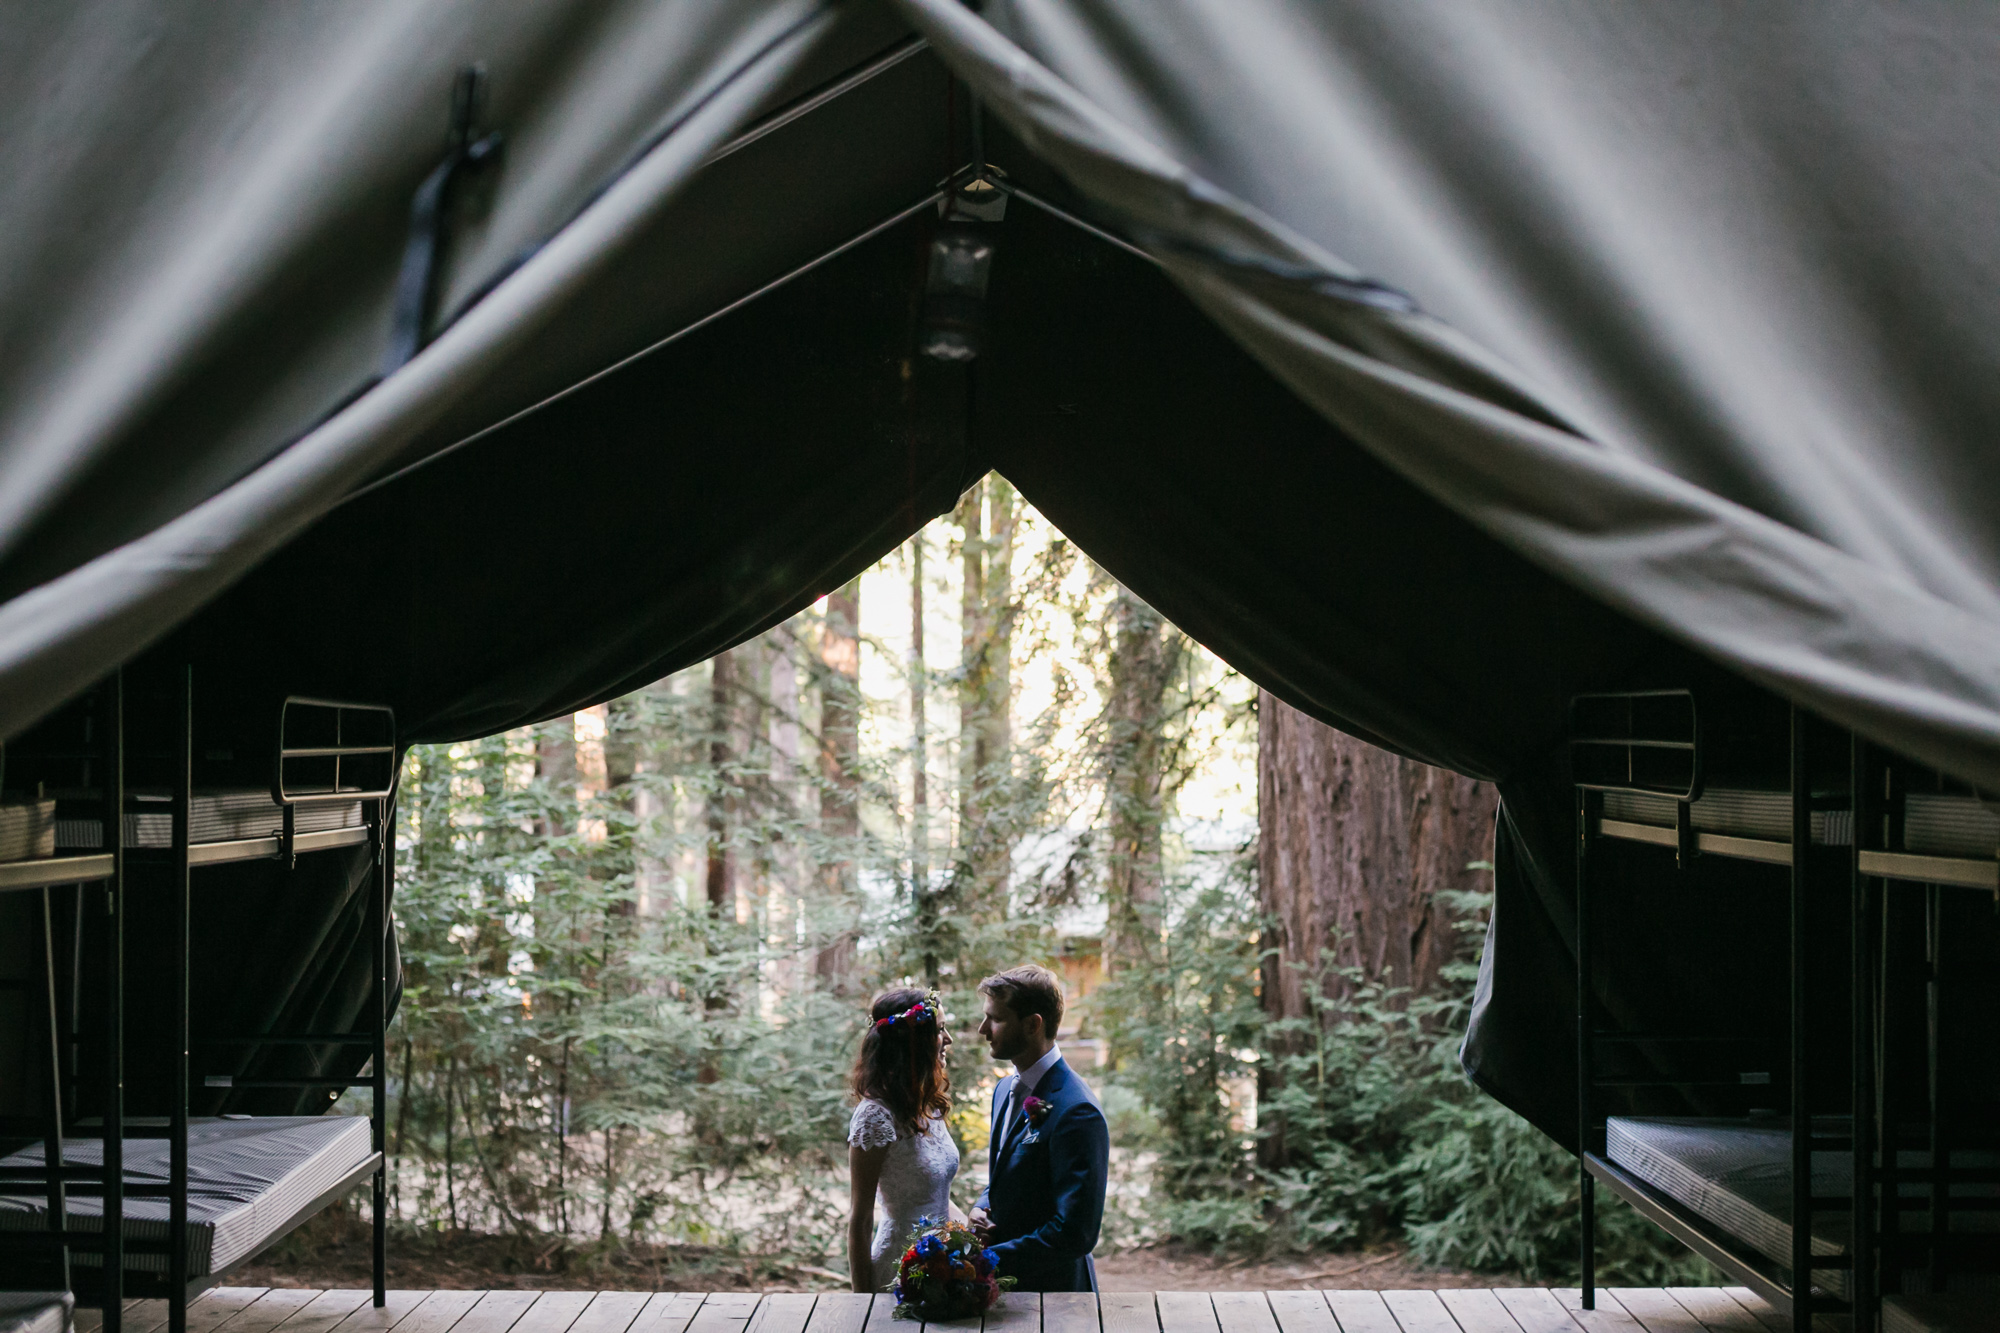 Silhouette of wedding couple as seen through a green canvas tent flap